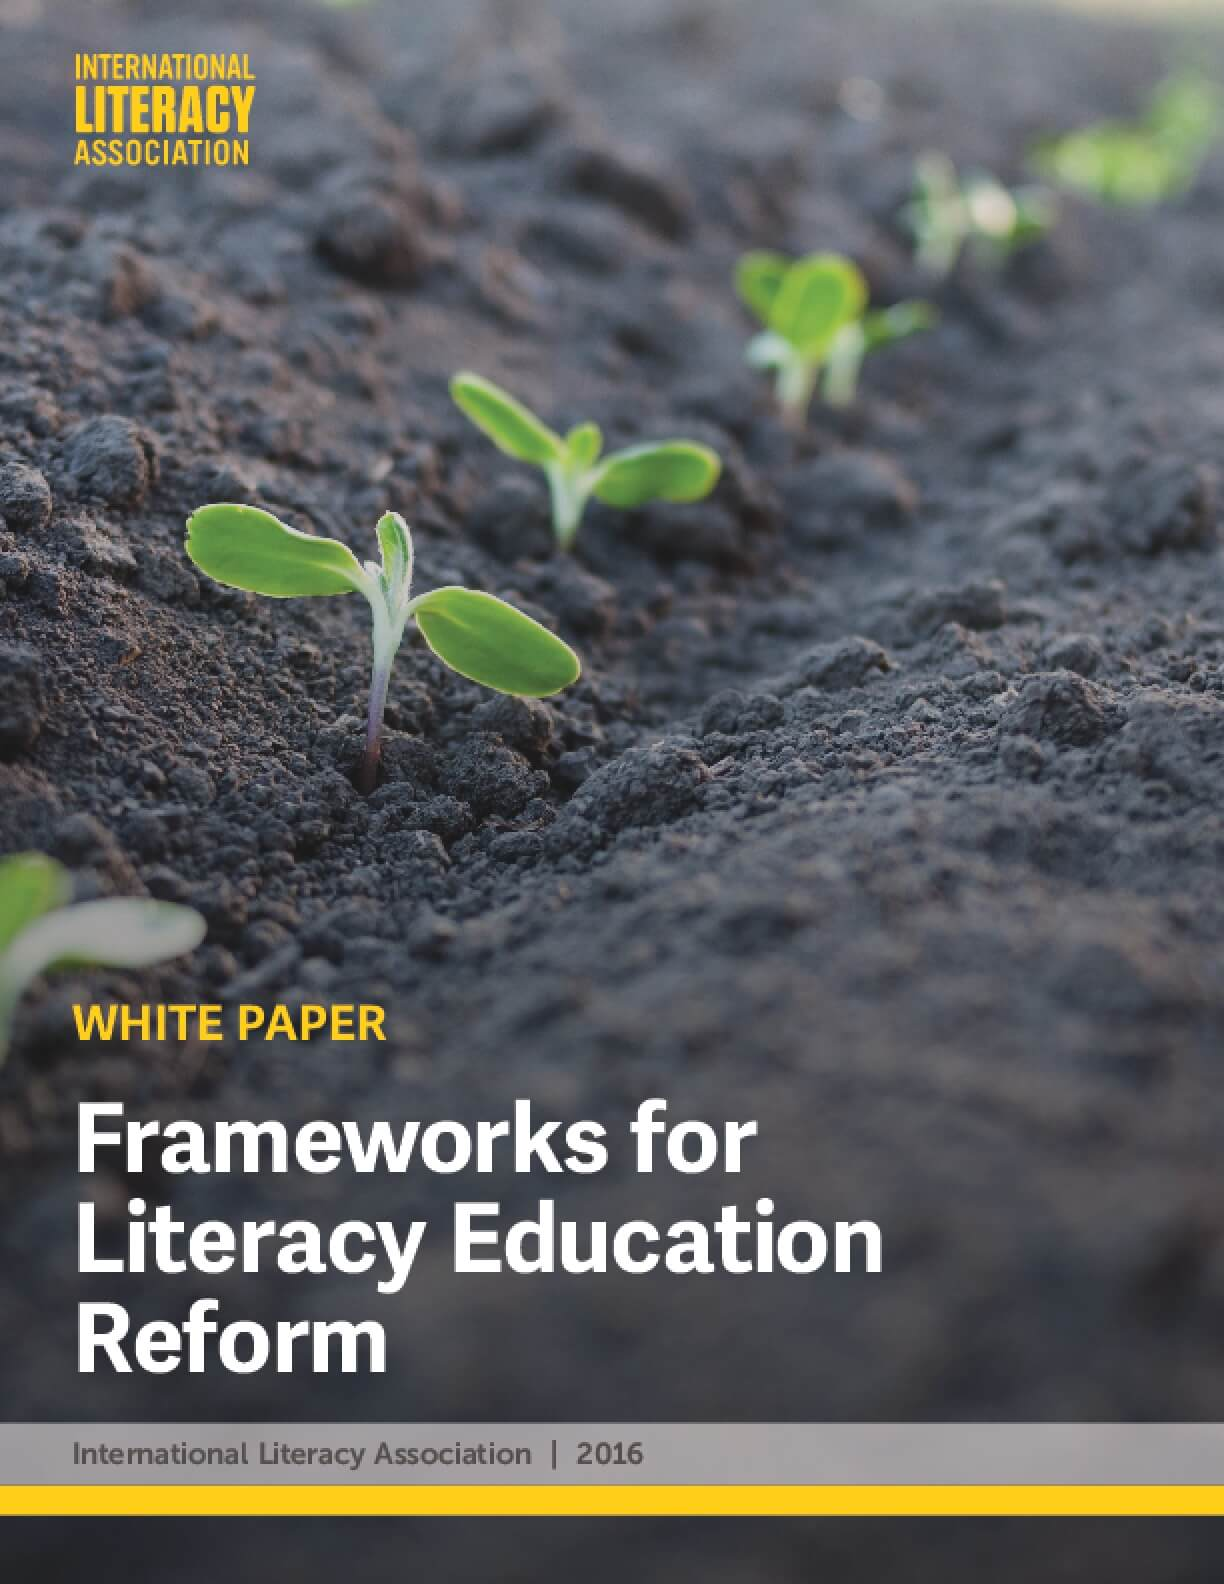 Frameworks for Literacy Education Reform